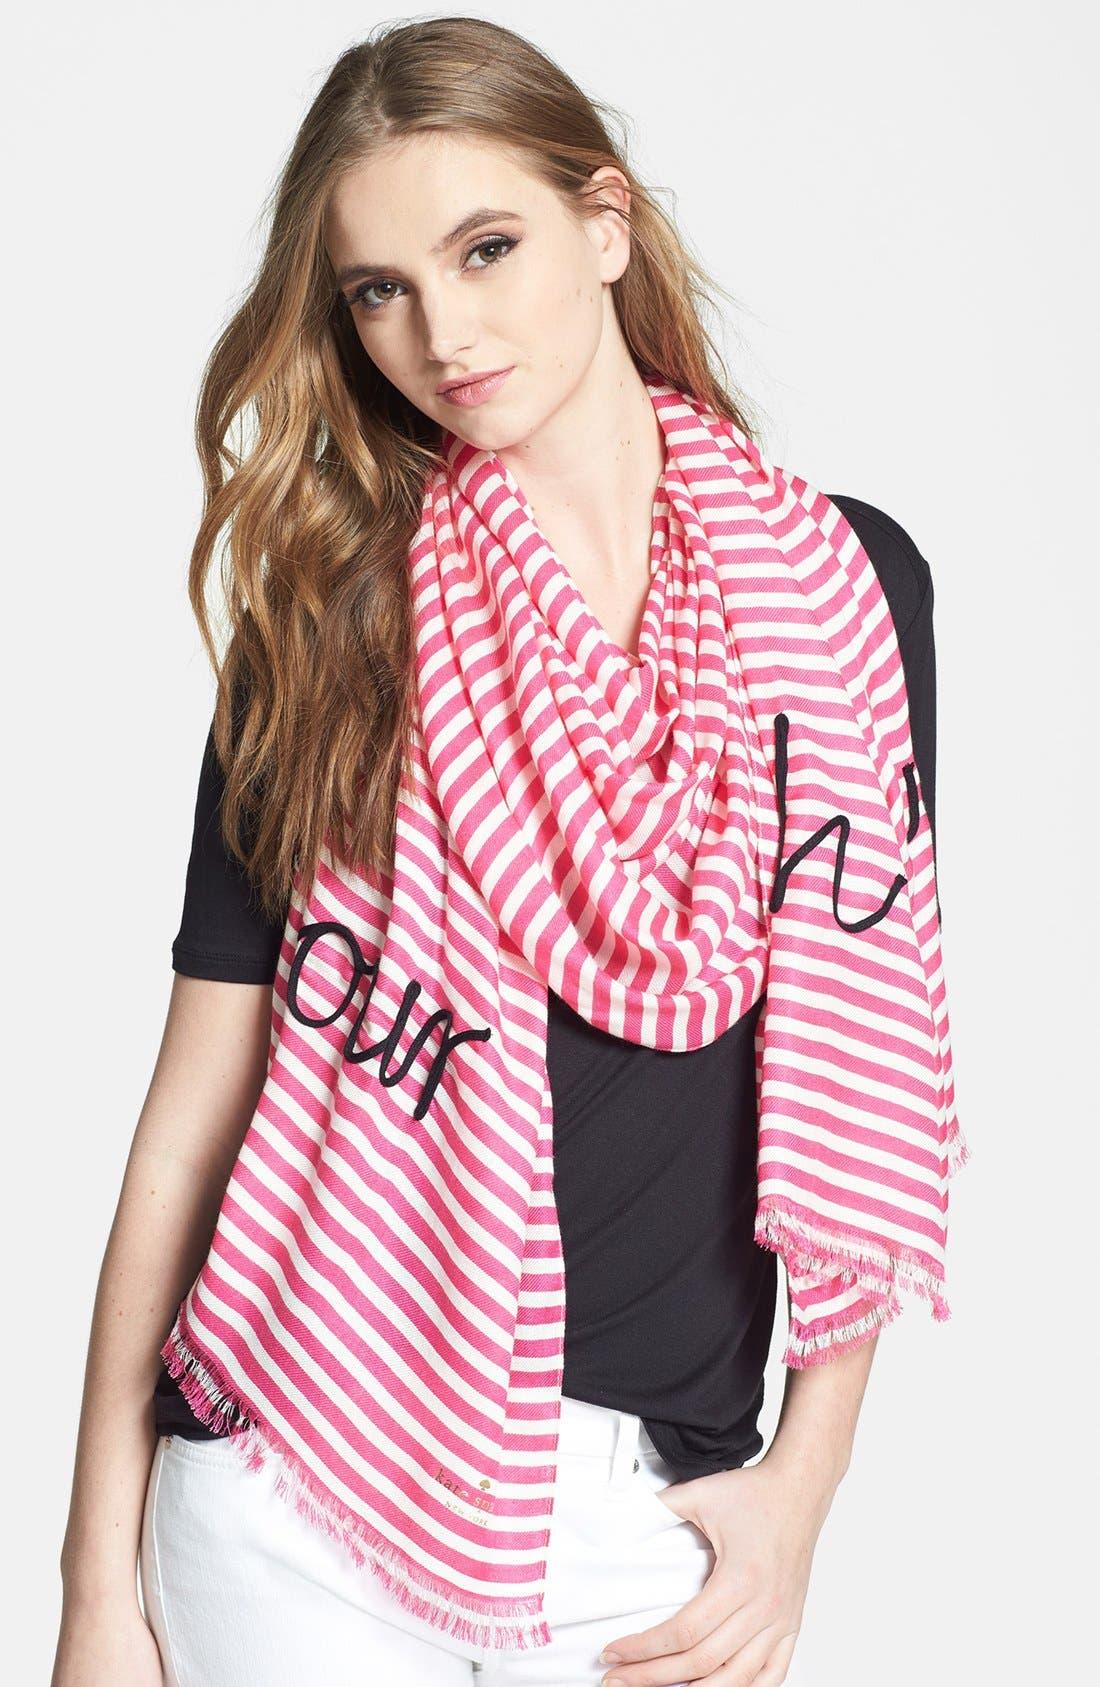 Main Image - kate spade new york 'ooh la la' embroidered scarf